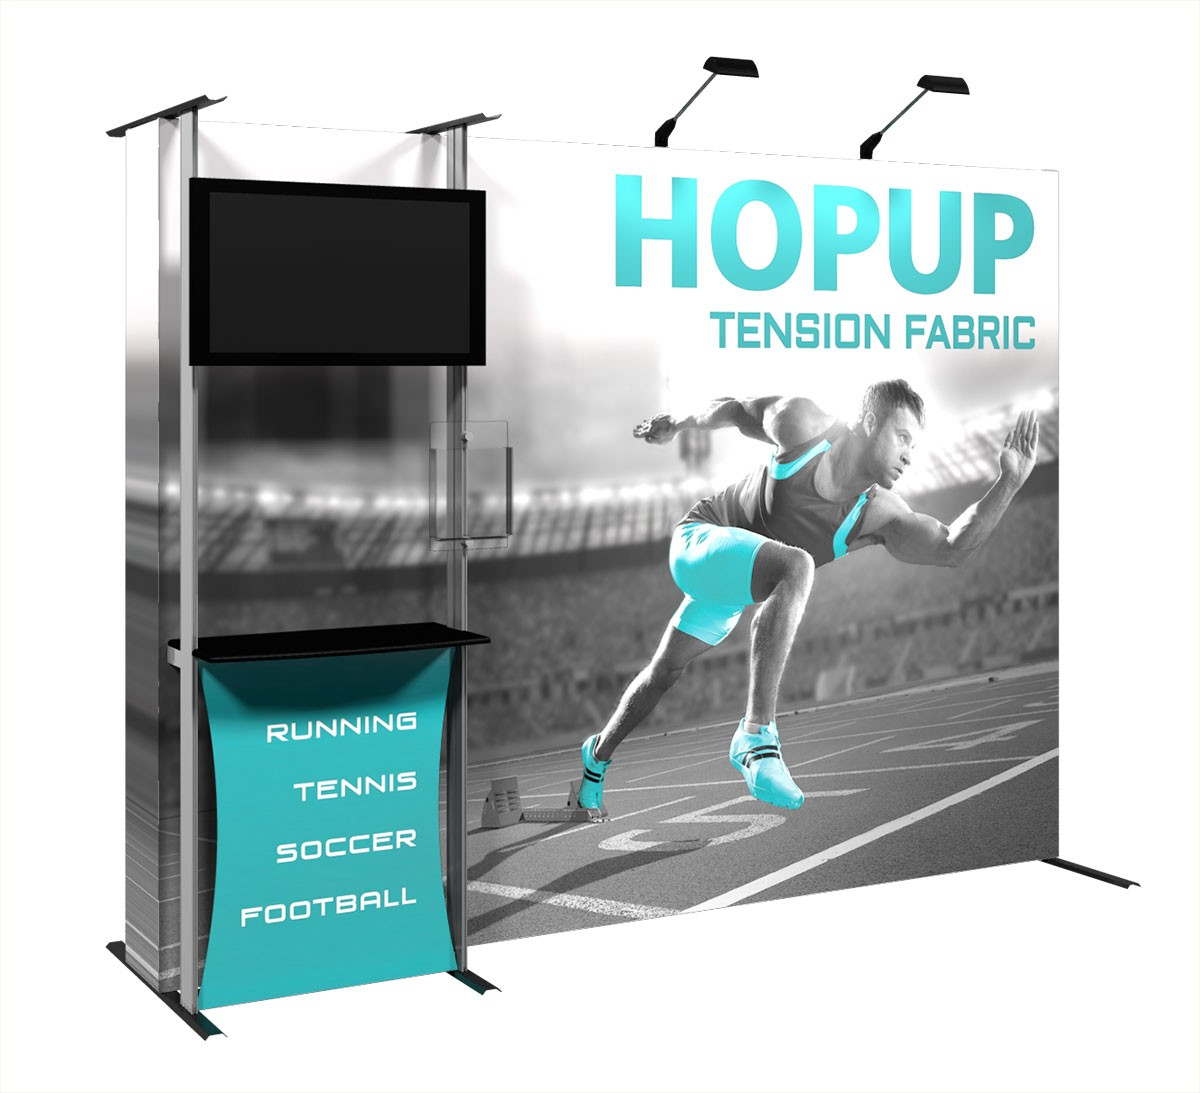 Hopup 4x3 Tension Fabric Pop Up Display